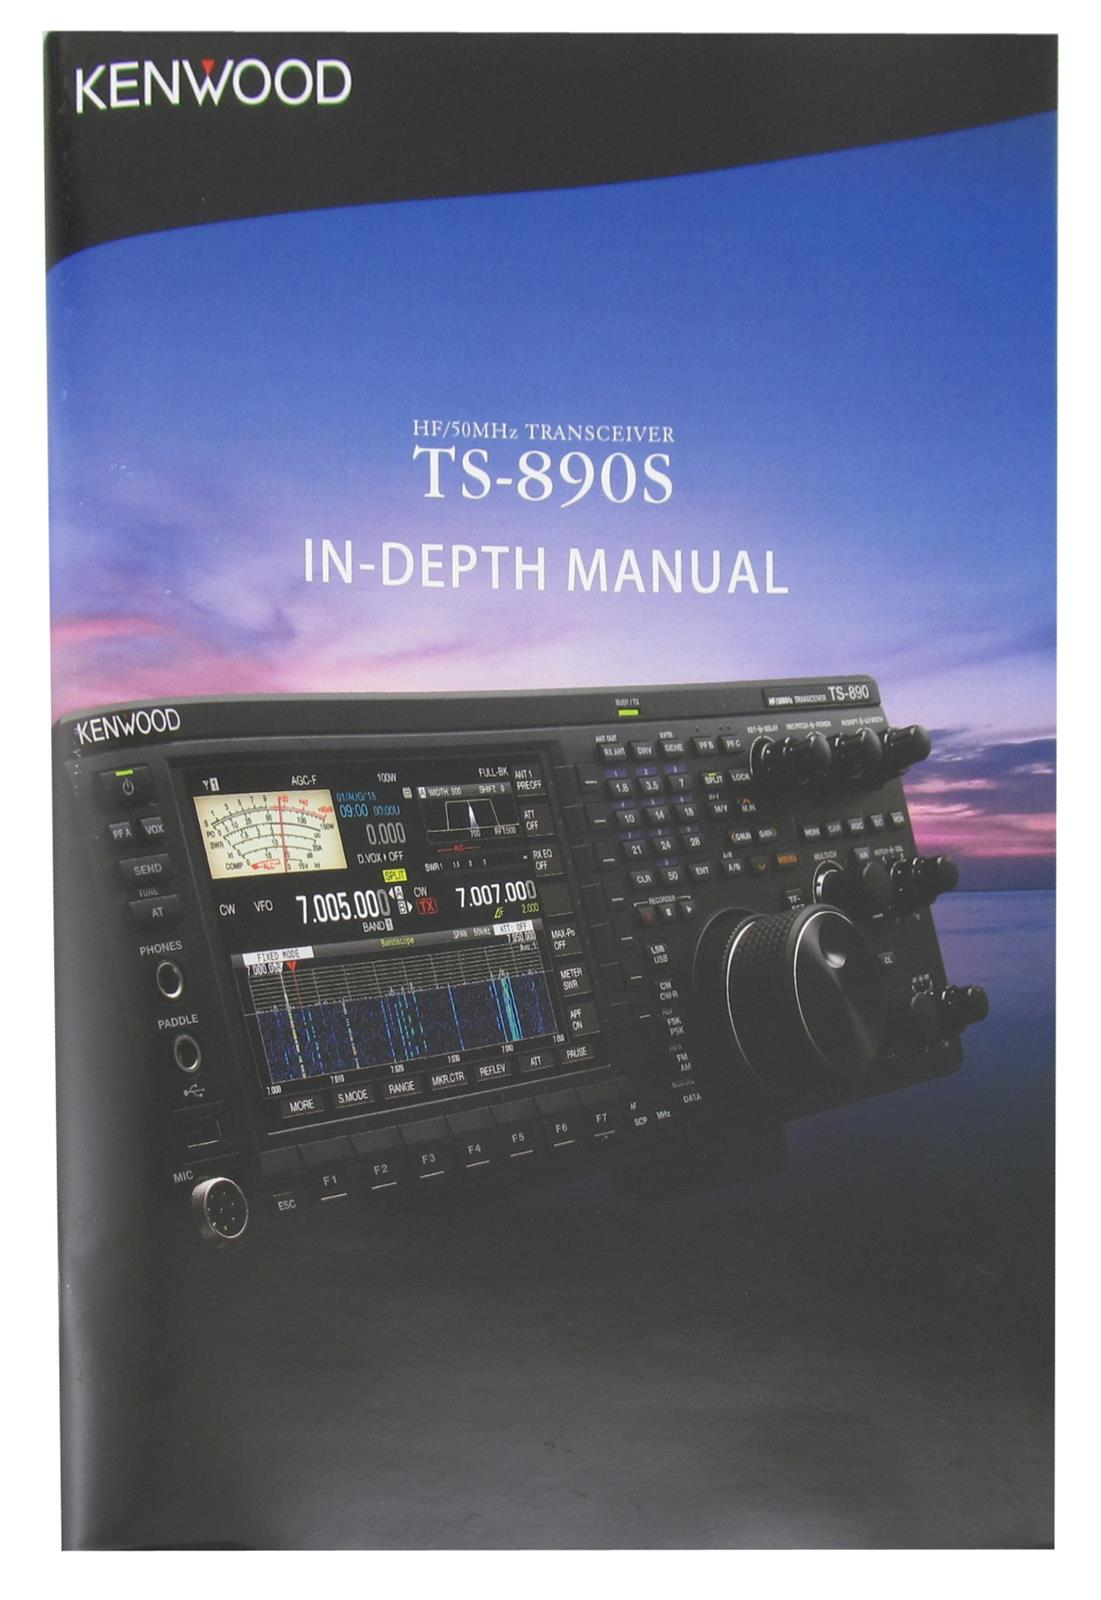 Kenwood TS-890S In-Depth Manual TS-890-GUIDE